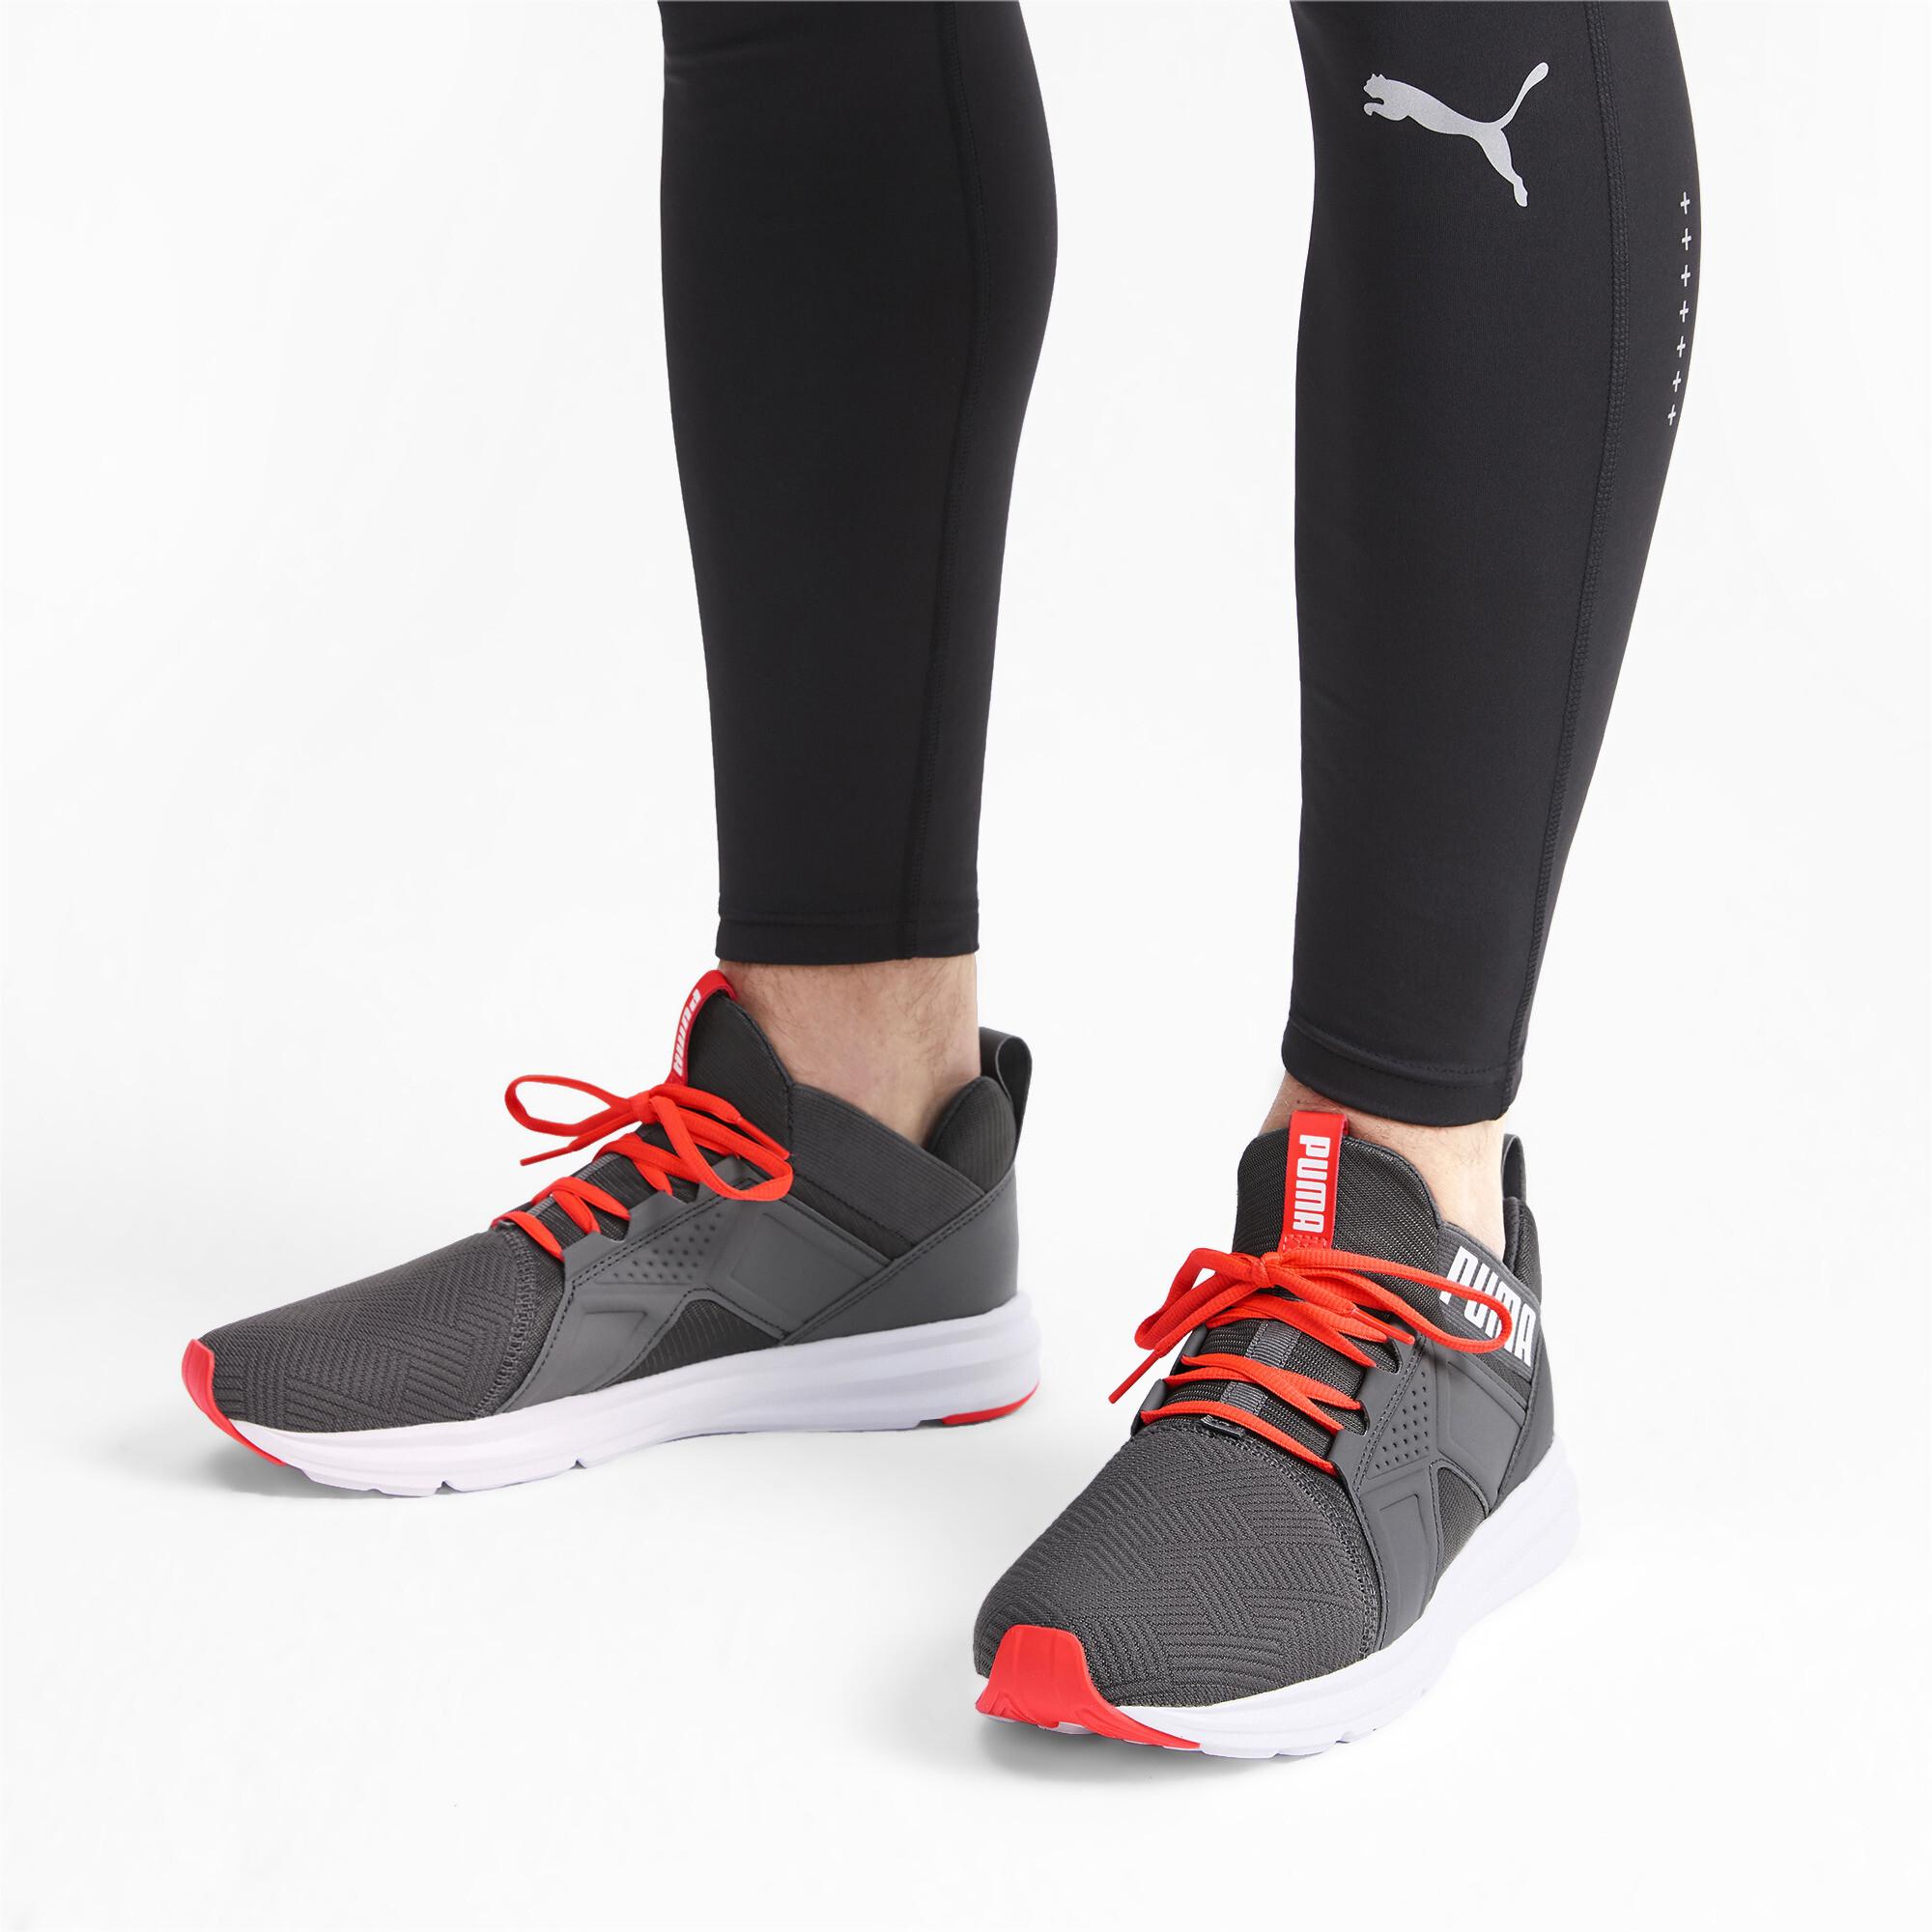 PUMA-Enzo-Geo-Men-s-Sneakers-Men-Shoe-Running thumbnail 11